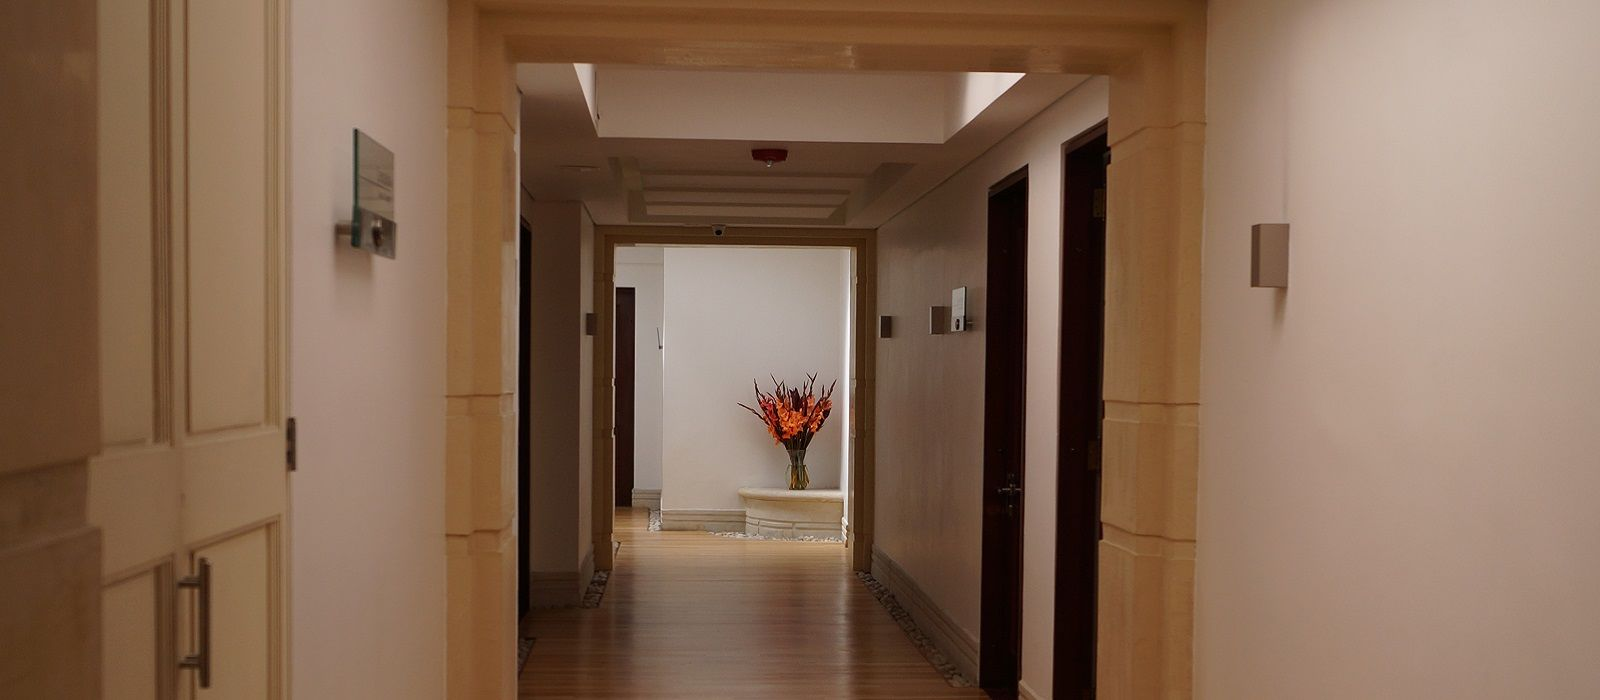 Hotel  de la Opera Colombia